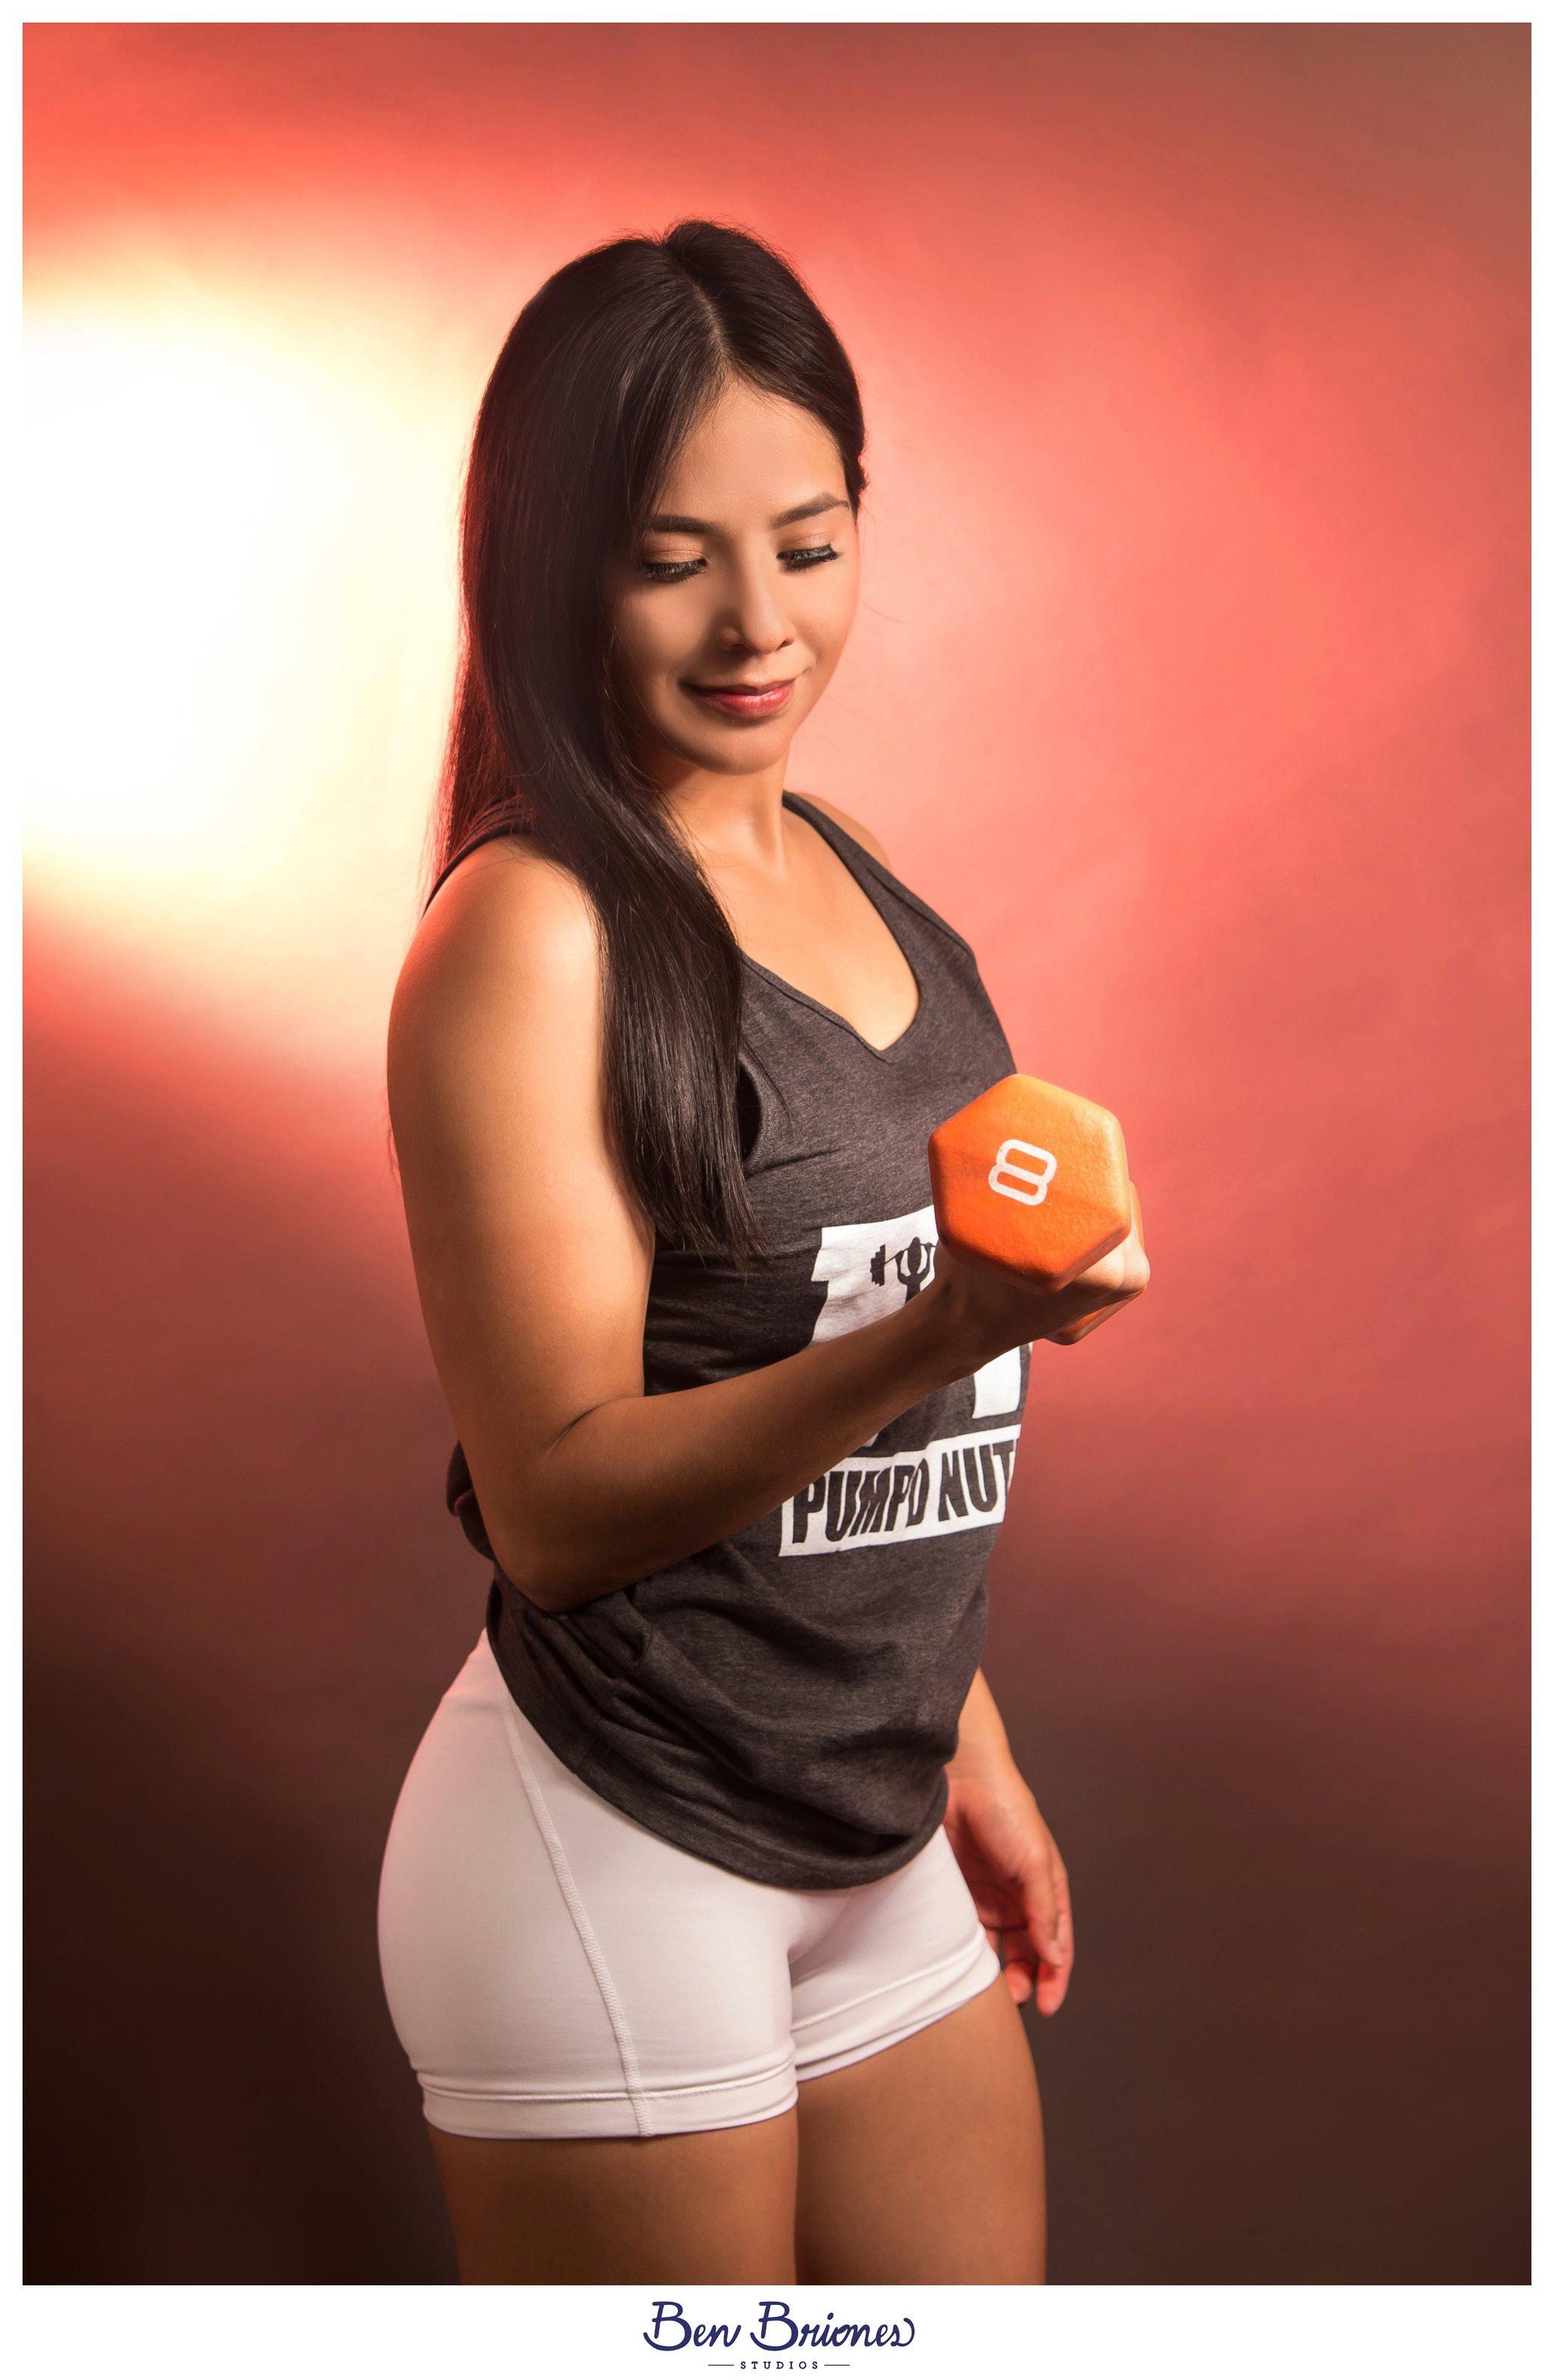 06.03.17_PRINT_Lorena Garcia Portraits_BBS-6272_pp